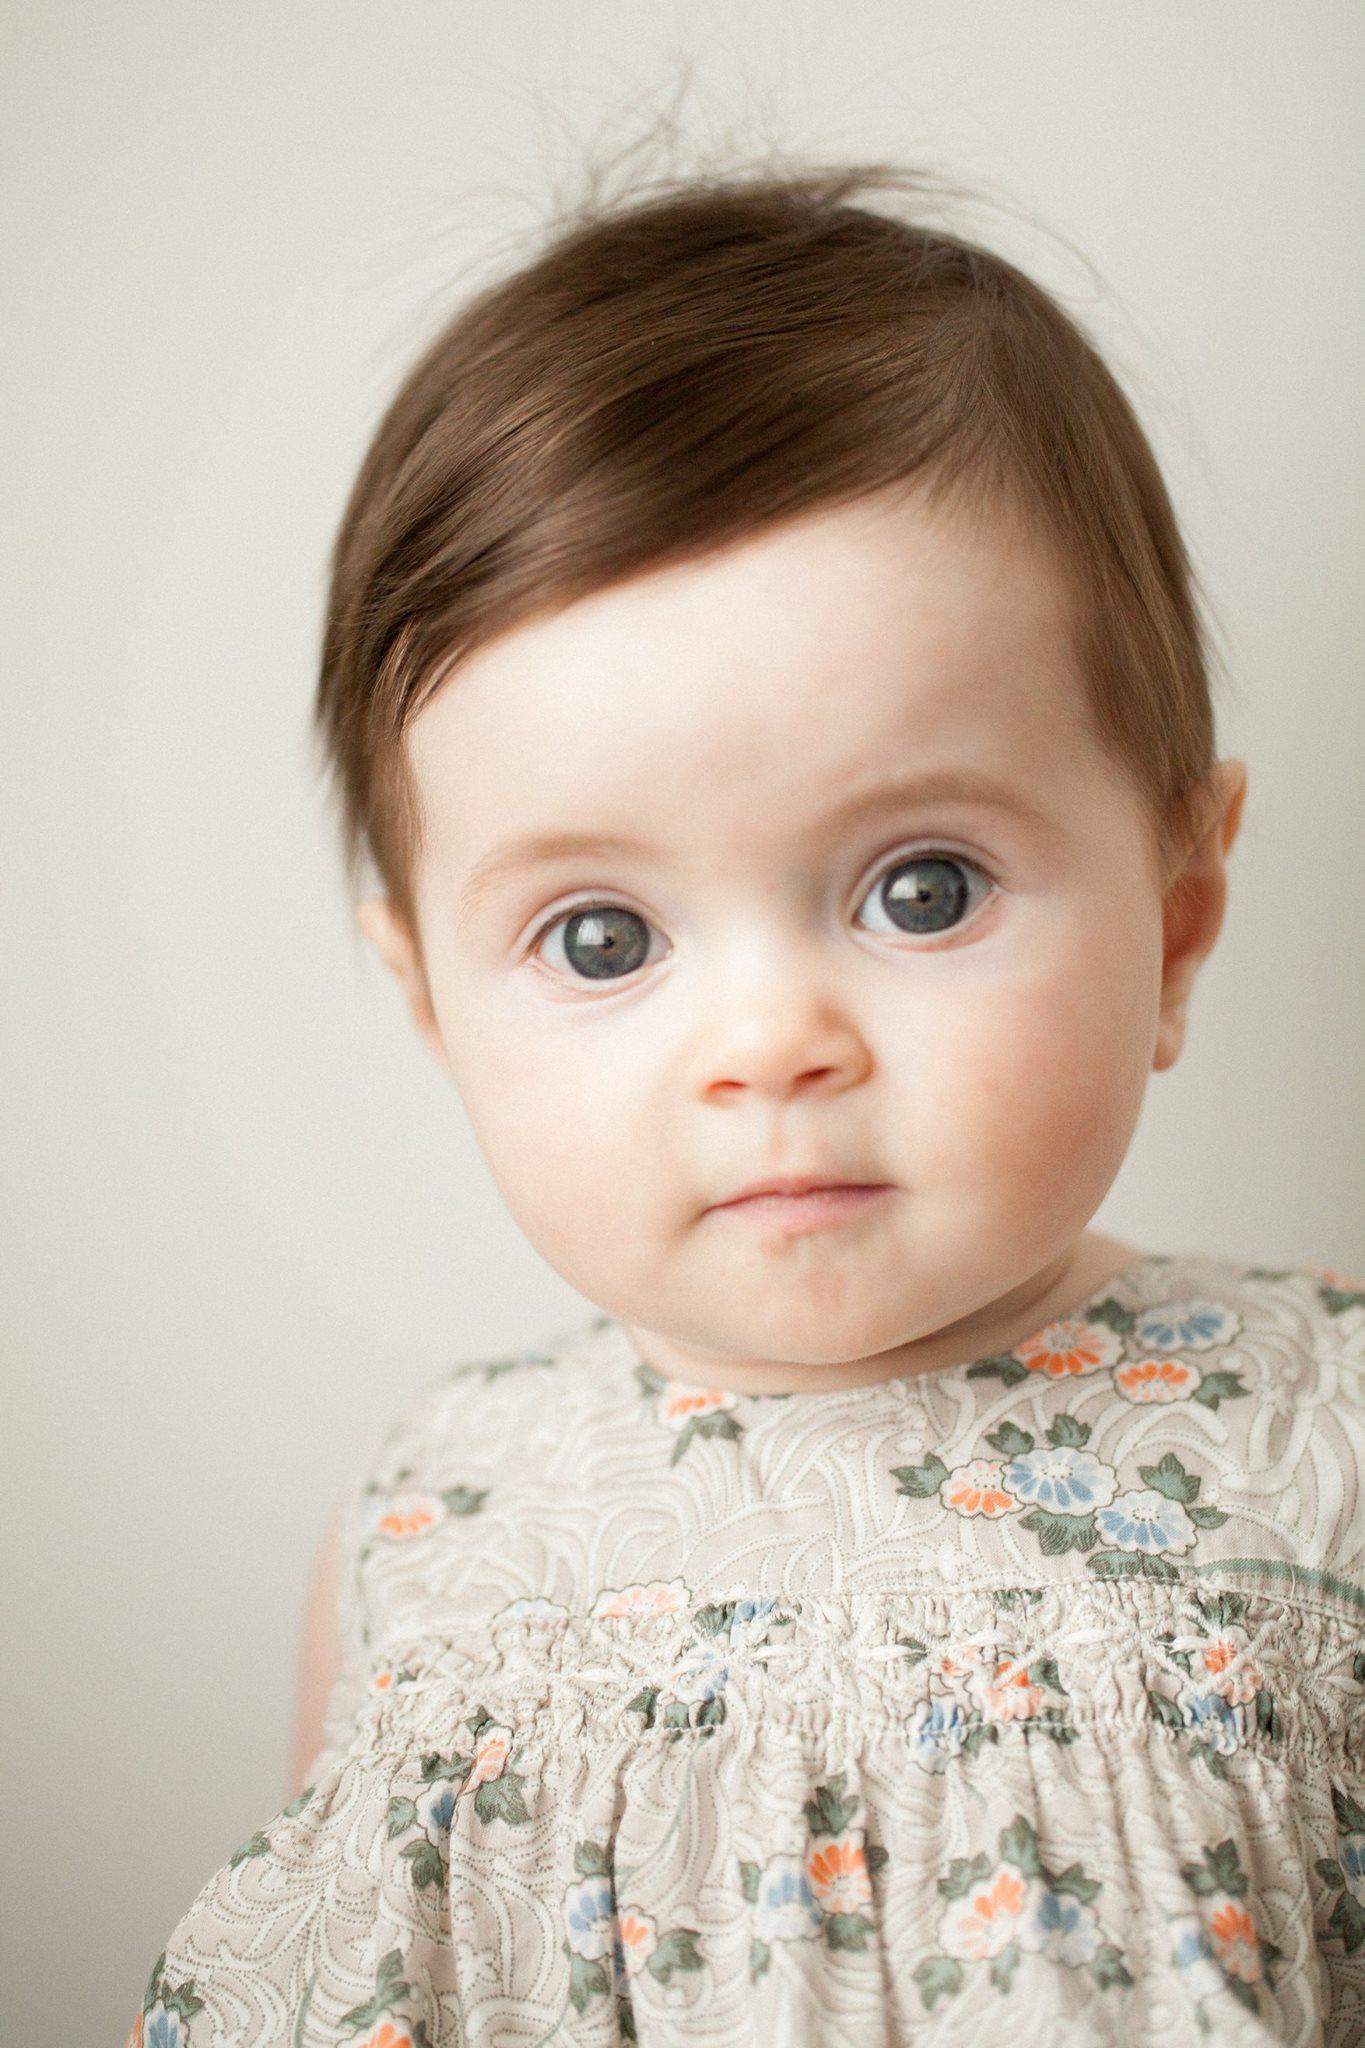 Newborn Photographer, Seattle WA.  Sandra Coan is an award winning maternity, newborn and family photographer